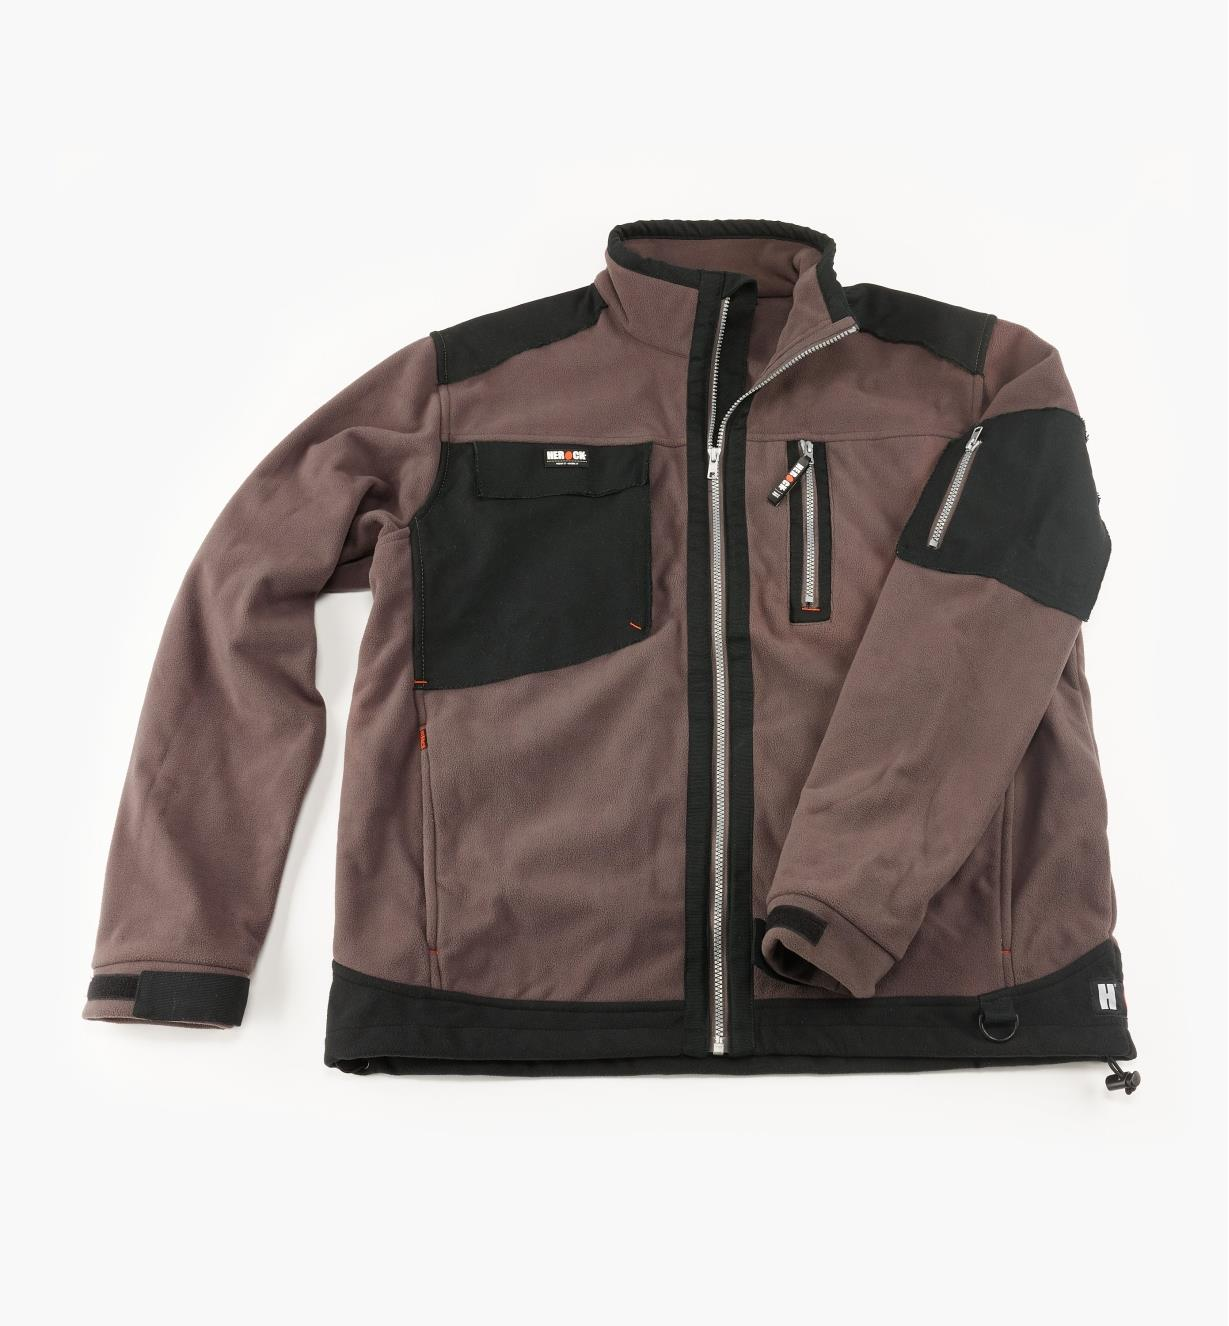 Herock Water-Resistant/Breathable Fleece Jacket, Gray